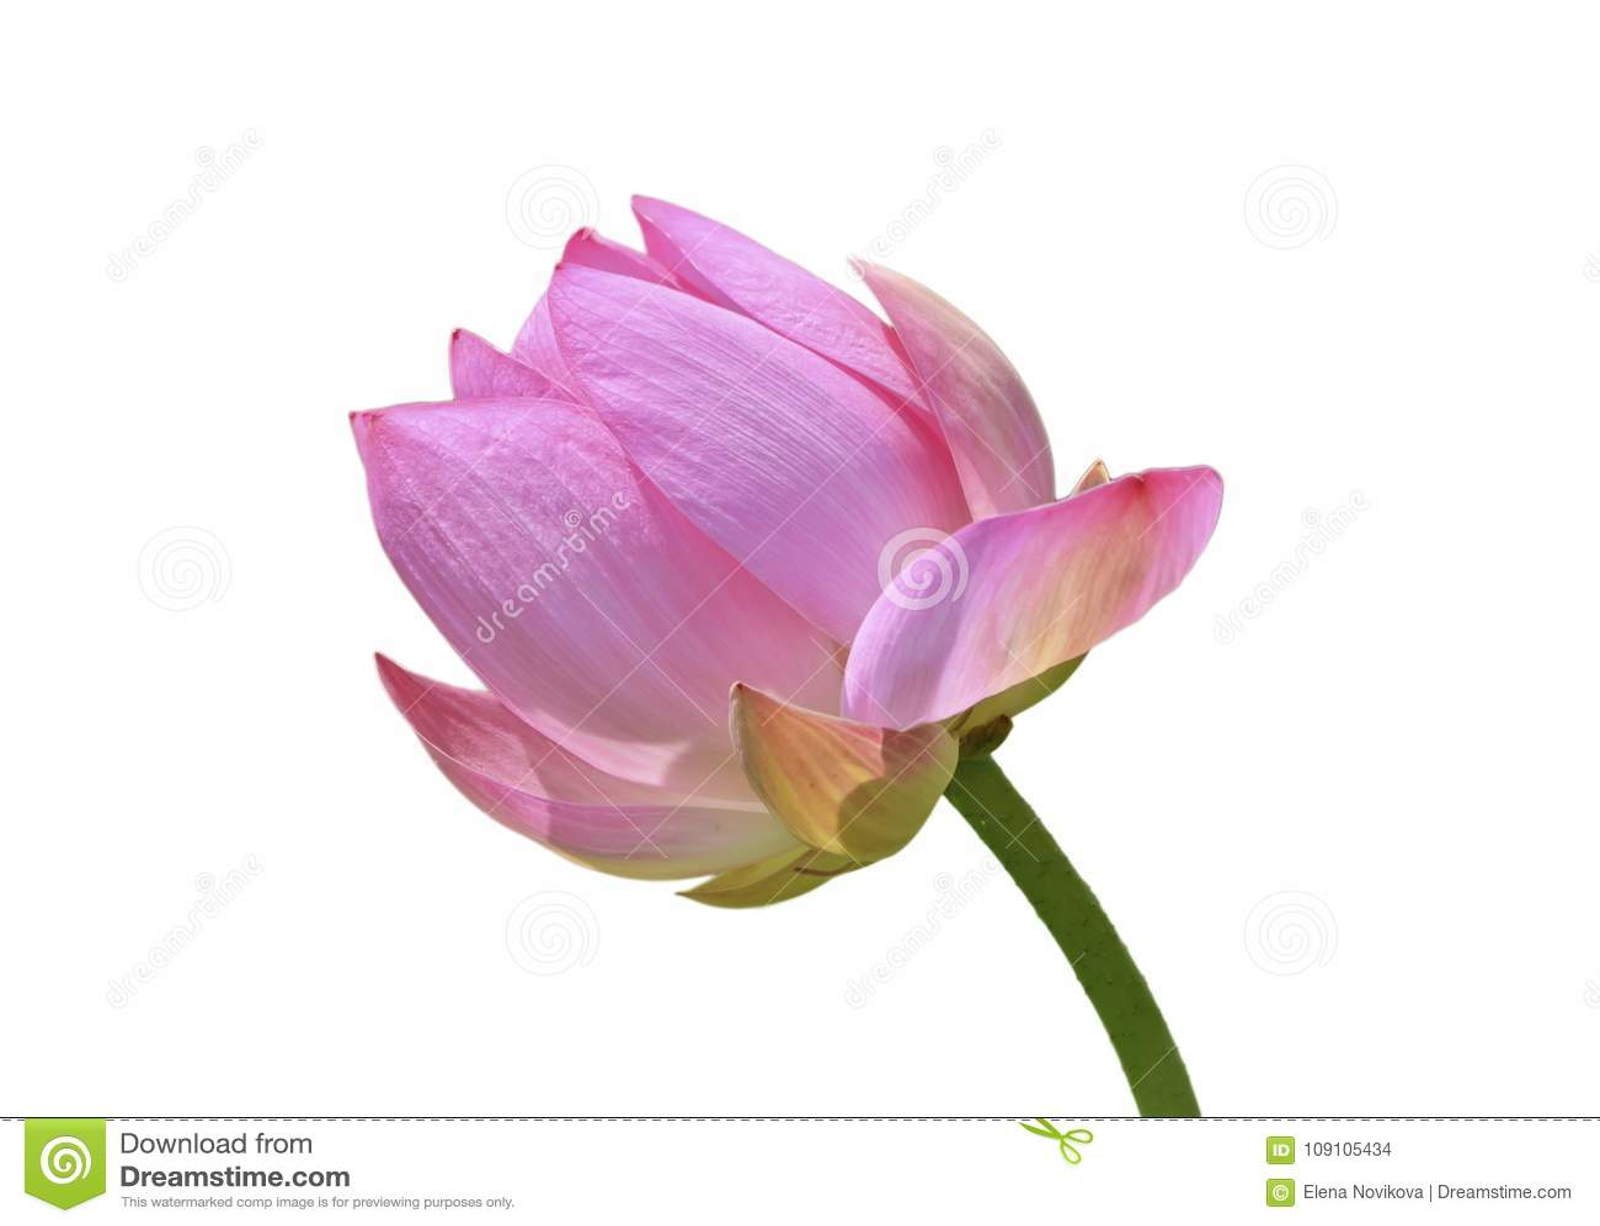 Lotus bud on the stem stock photo image of exotic 109105434 lotus bud on the stem izmirmasajfo